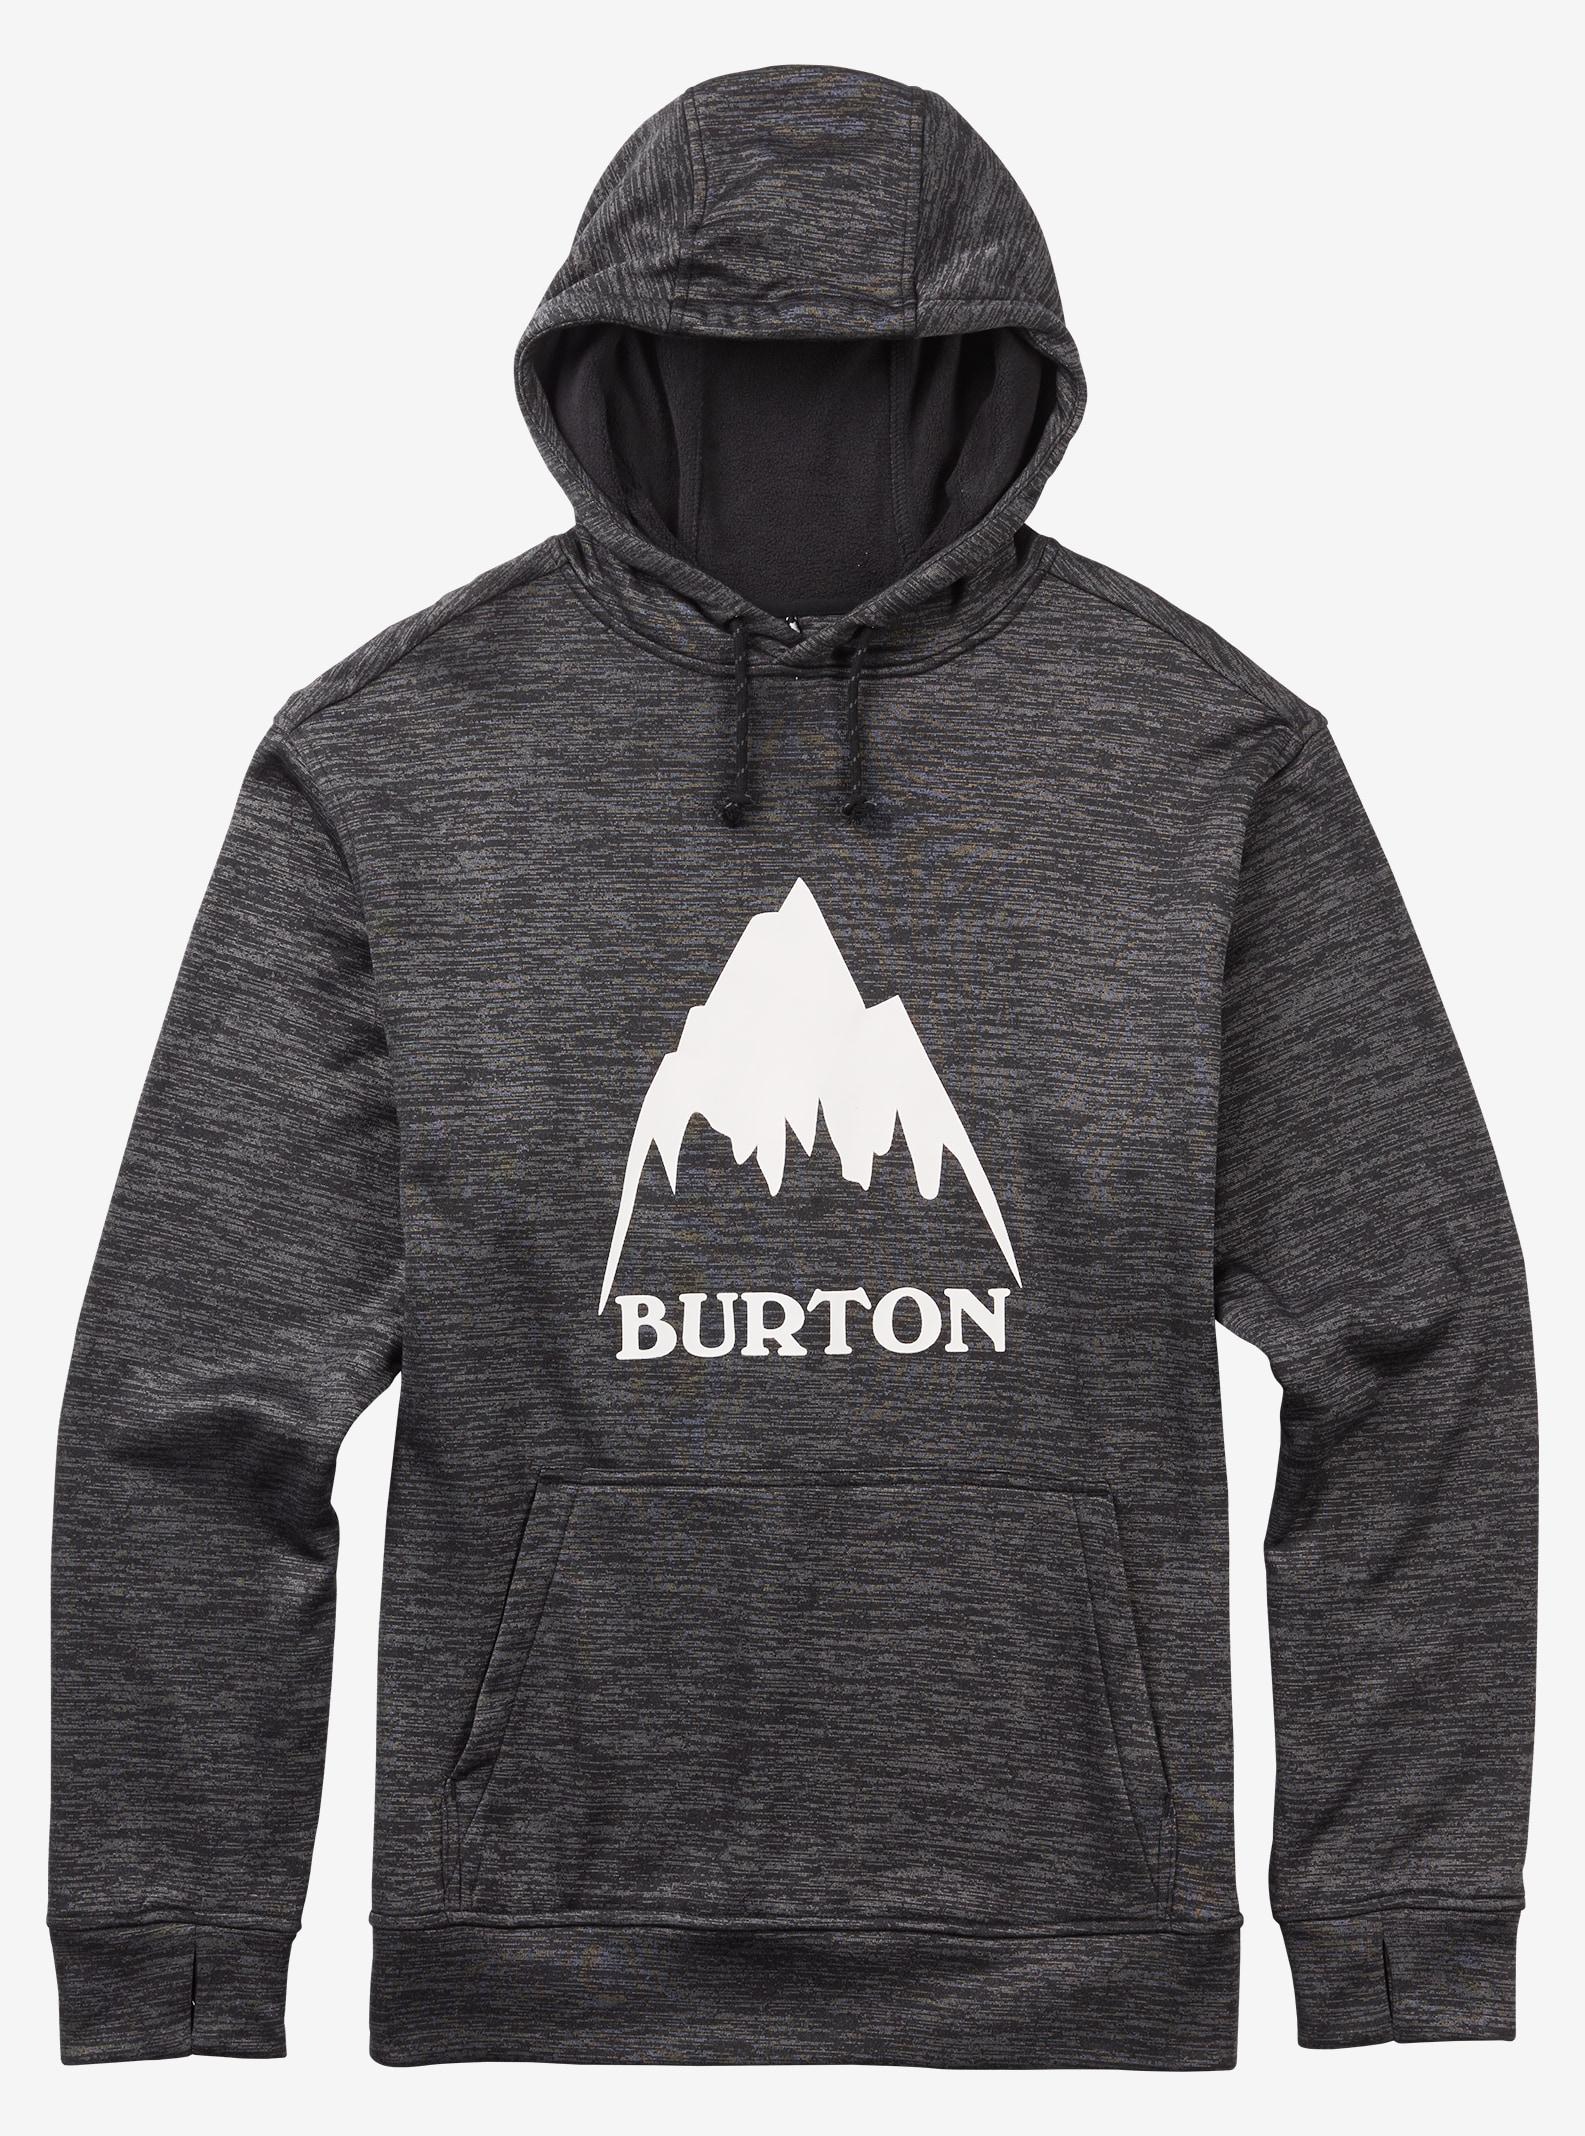 Burton Oak Pullover Hoodie shown in True Black Heather